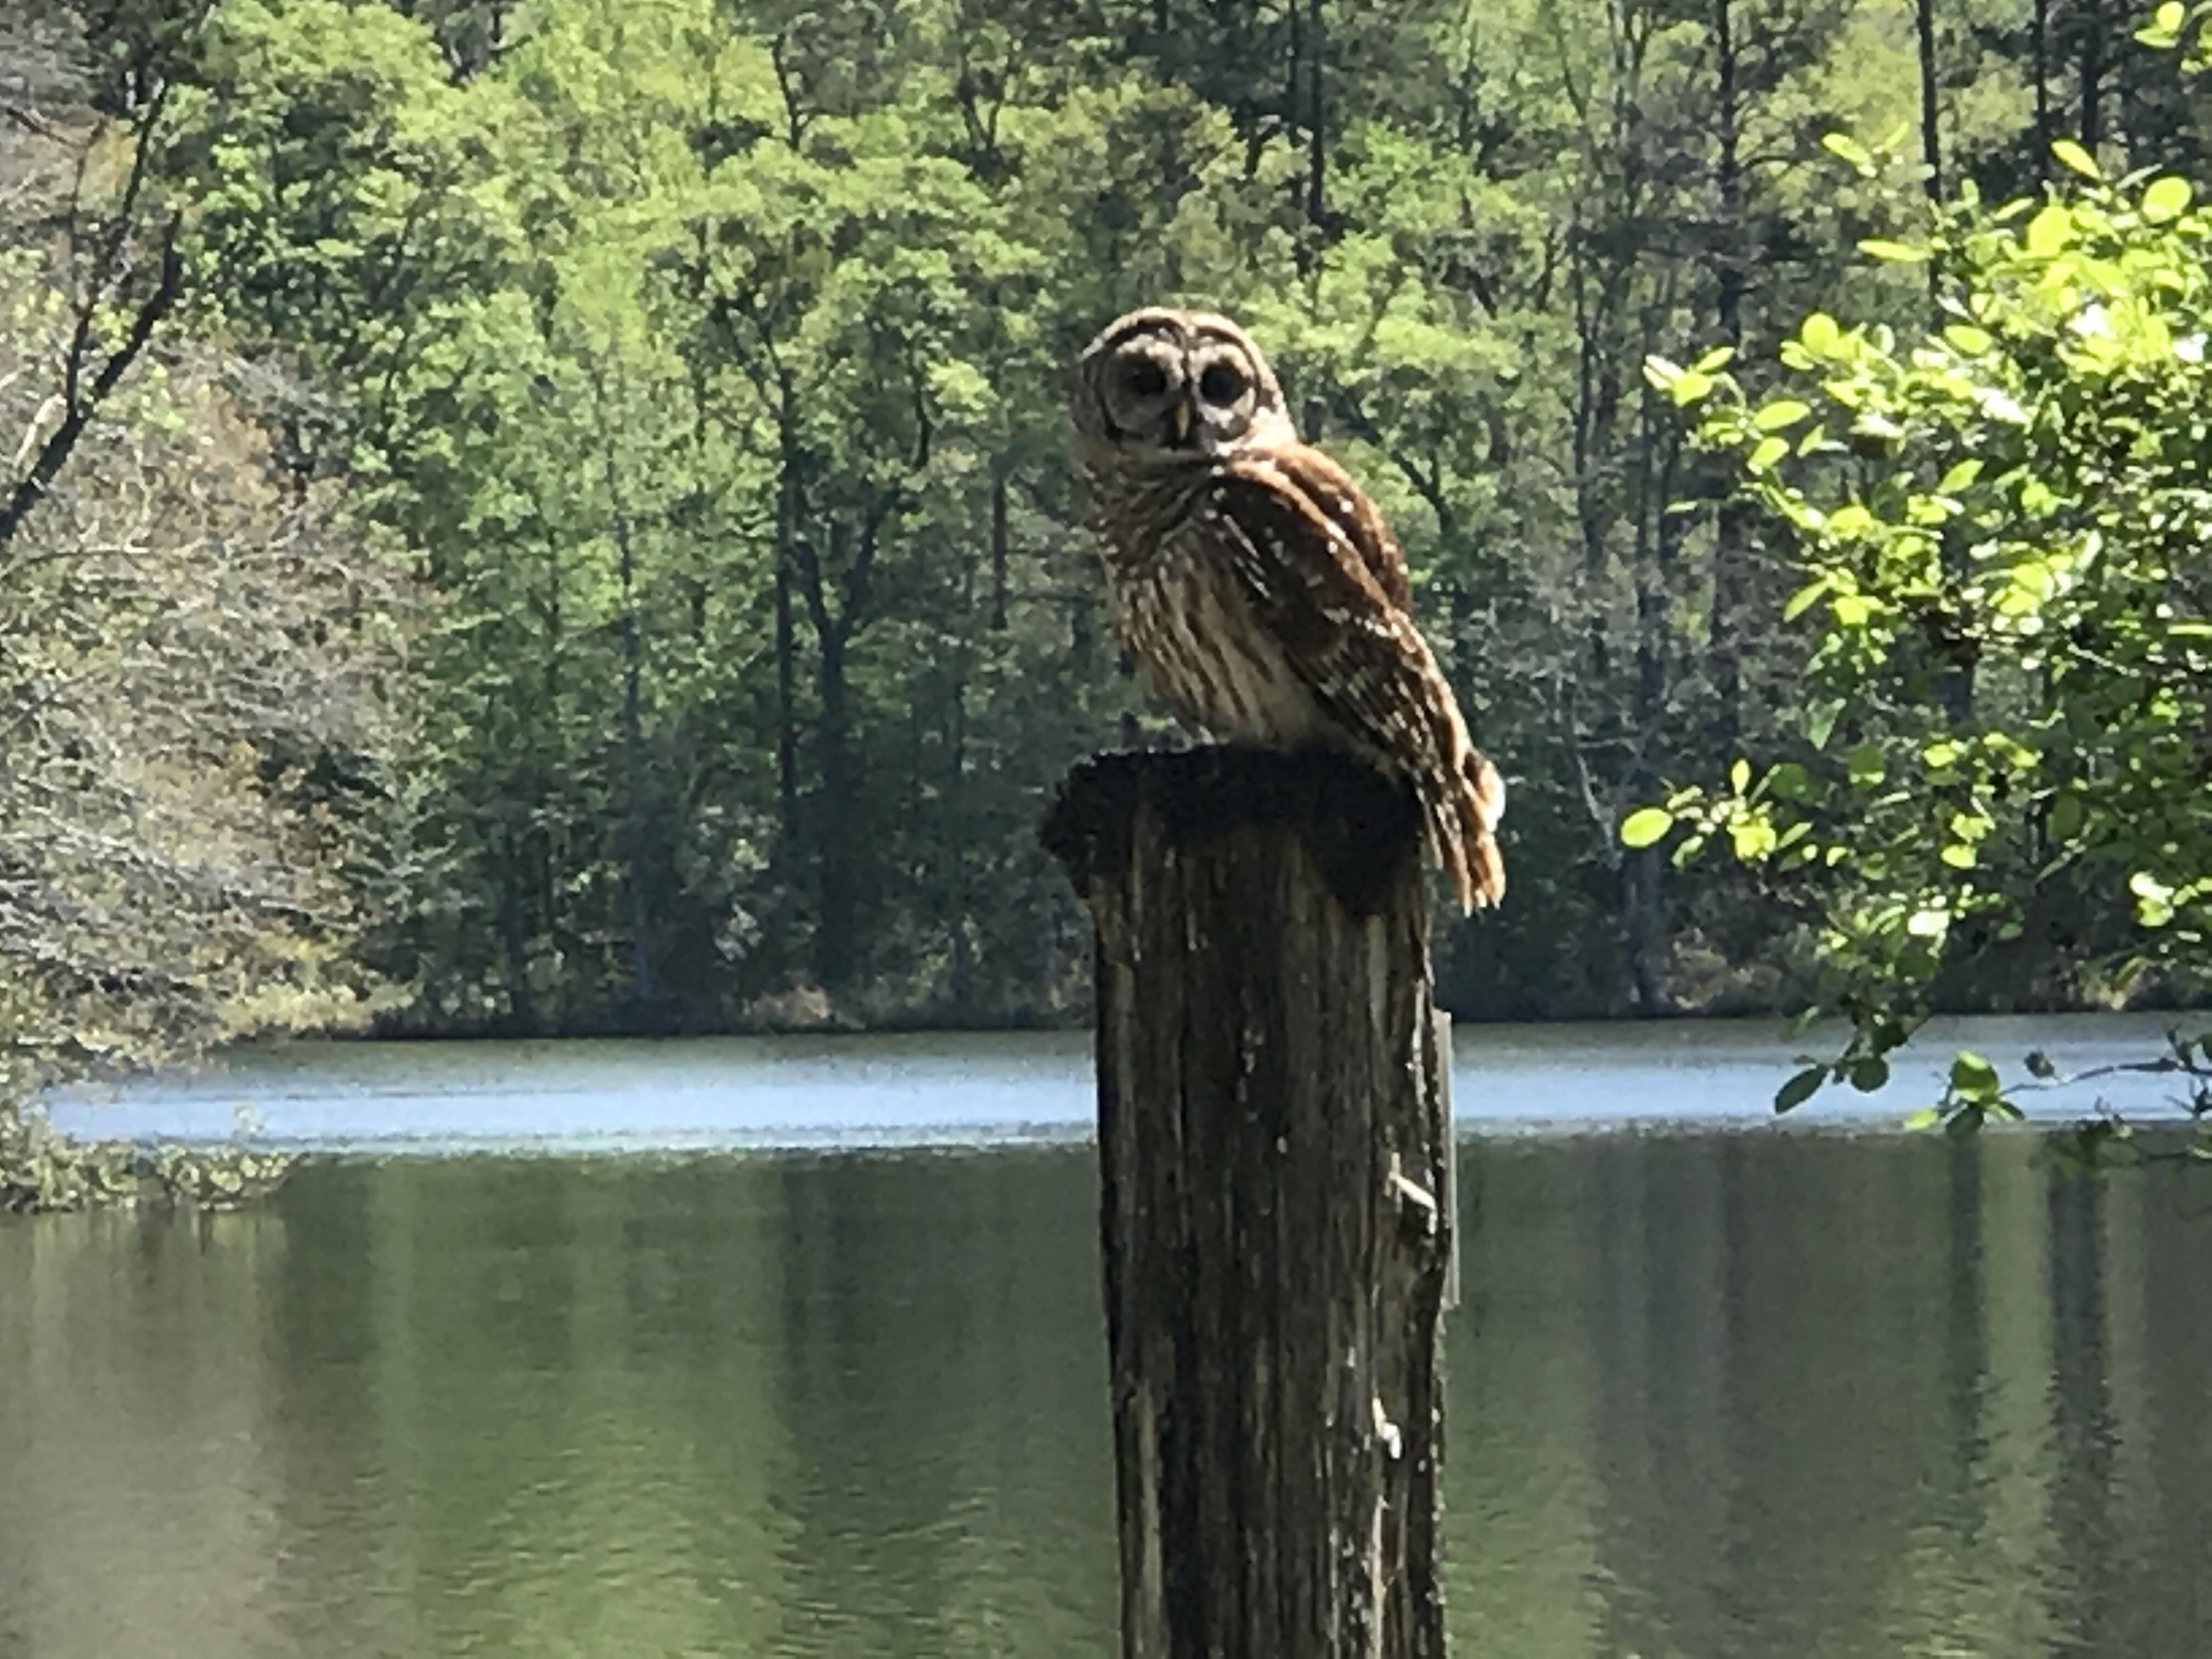 Barred Owl Birds of Prey demonstration at Callaway Gardens